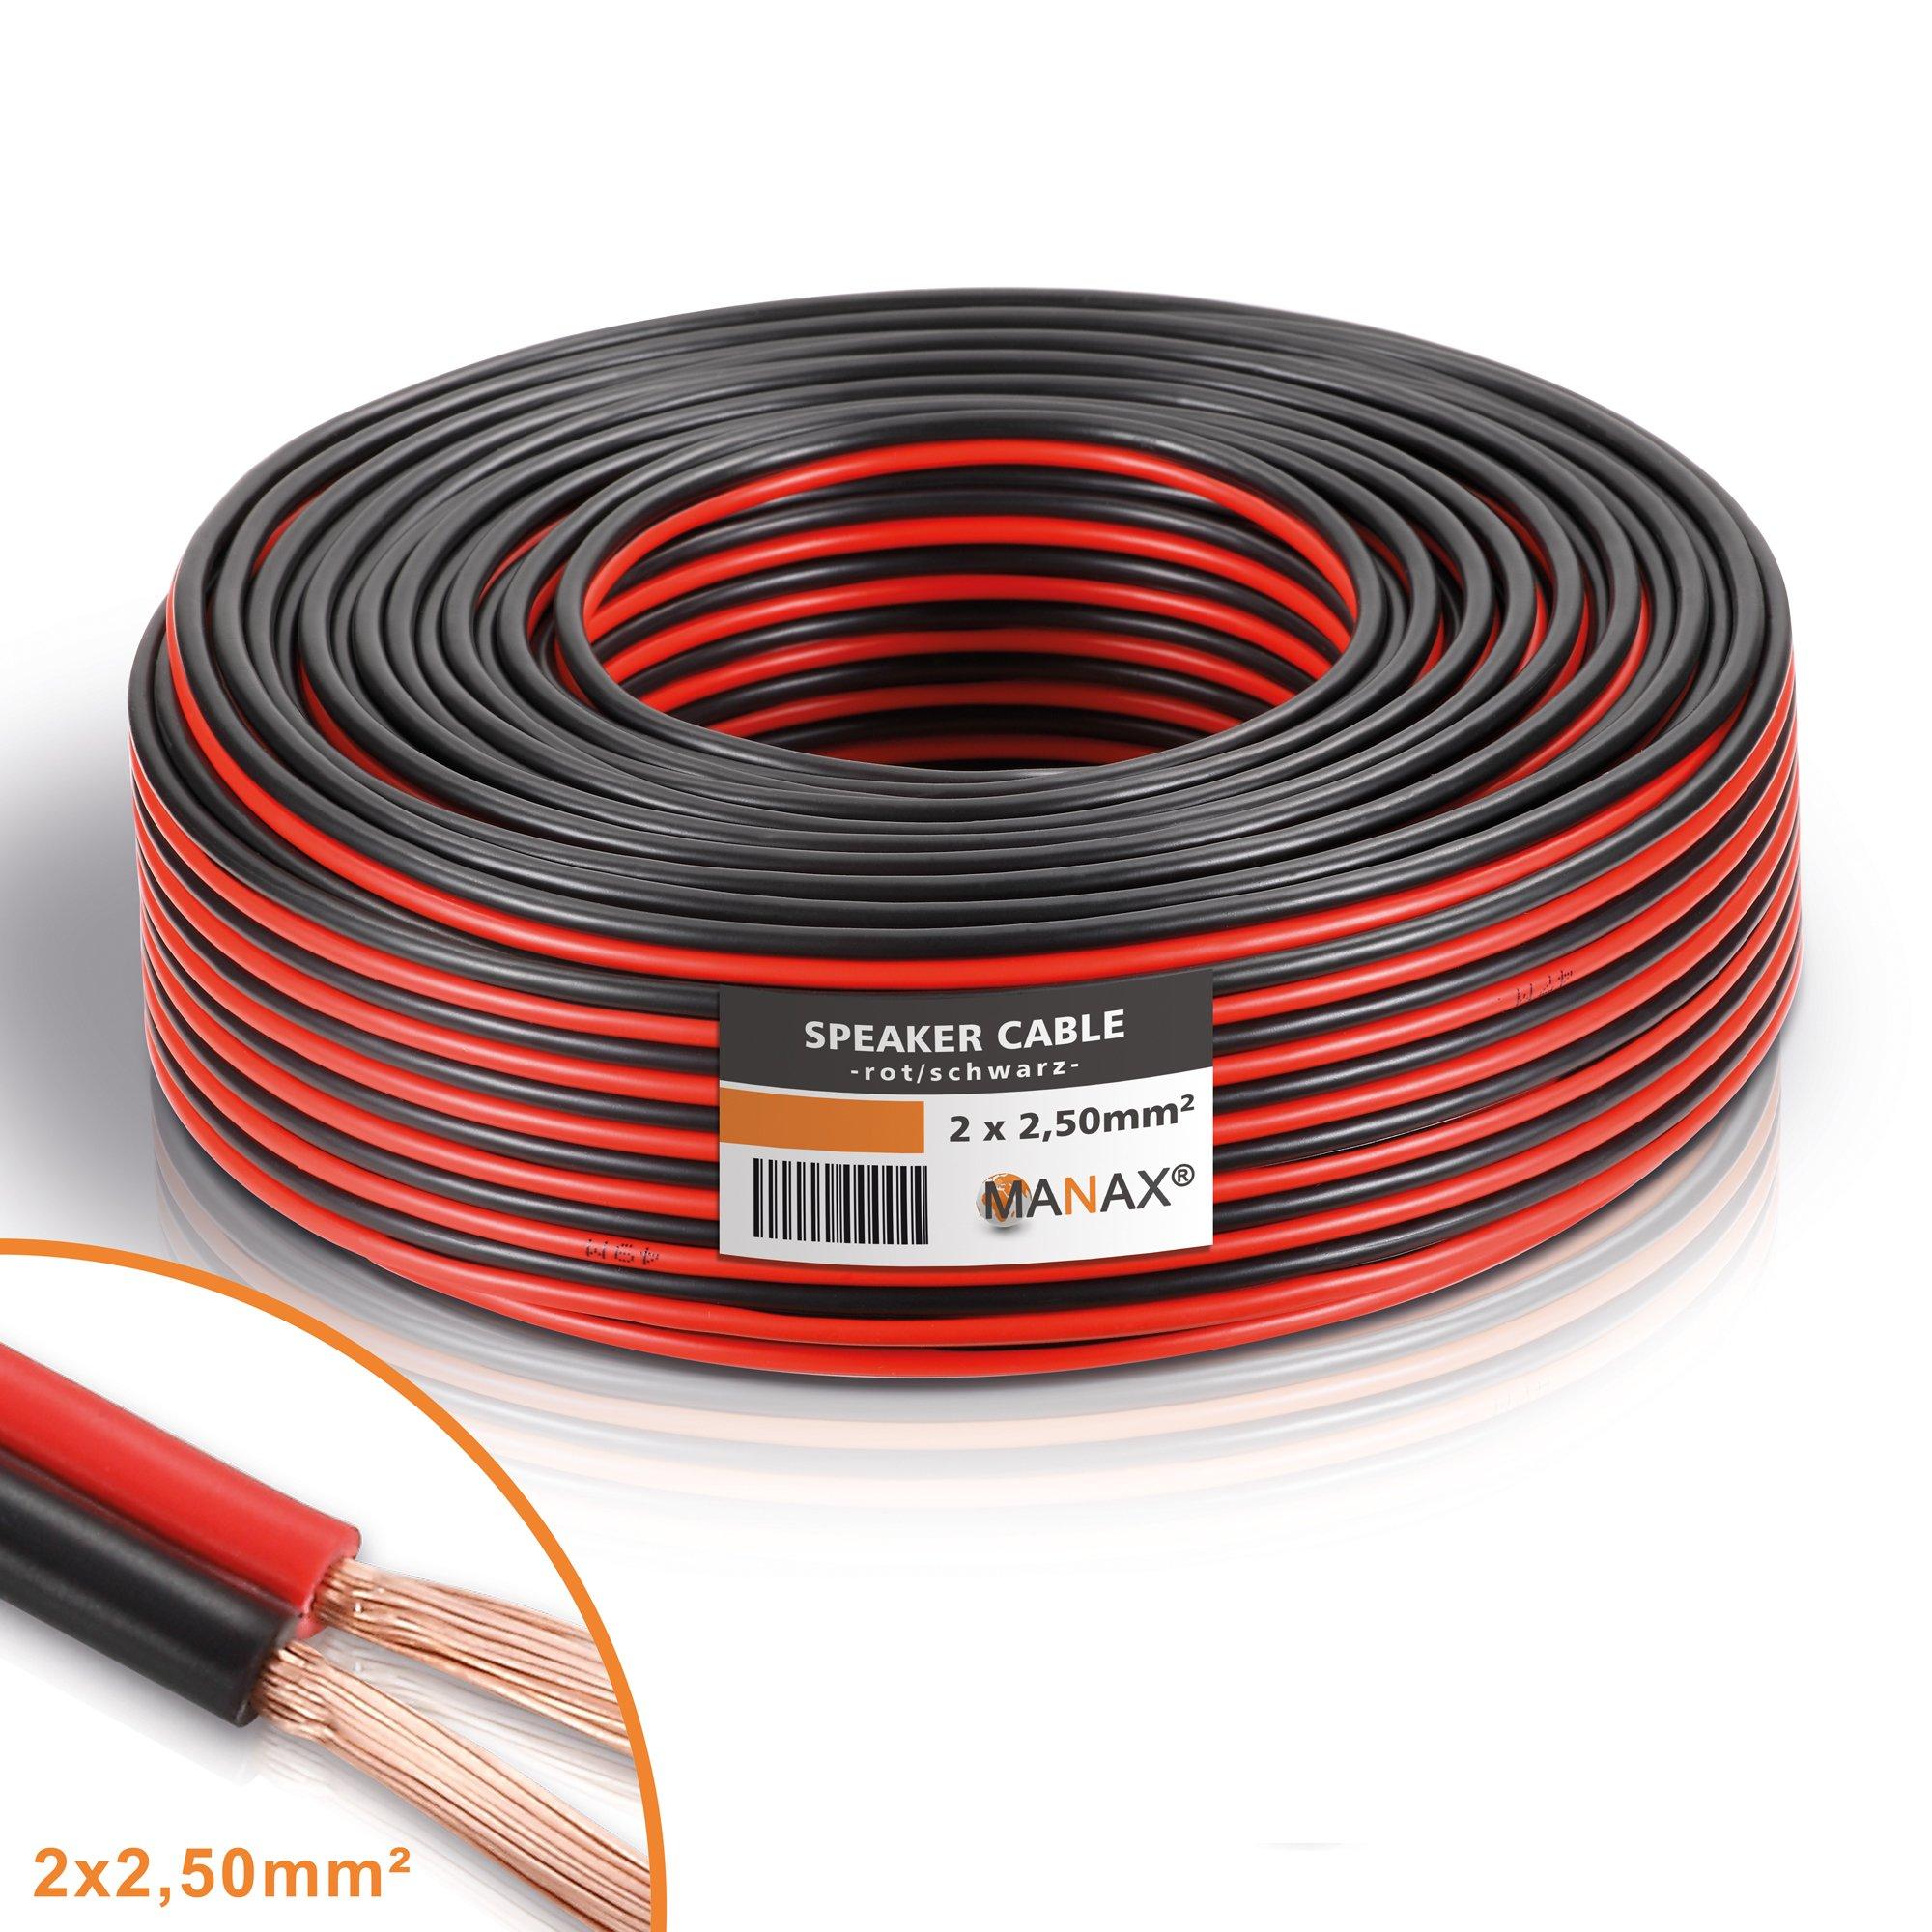 Cable para altavoz CCA 2 x 2,5 mm², color rojo/negro product